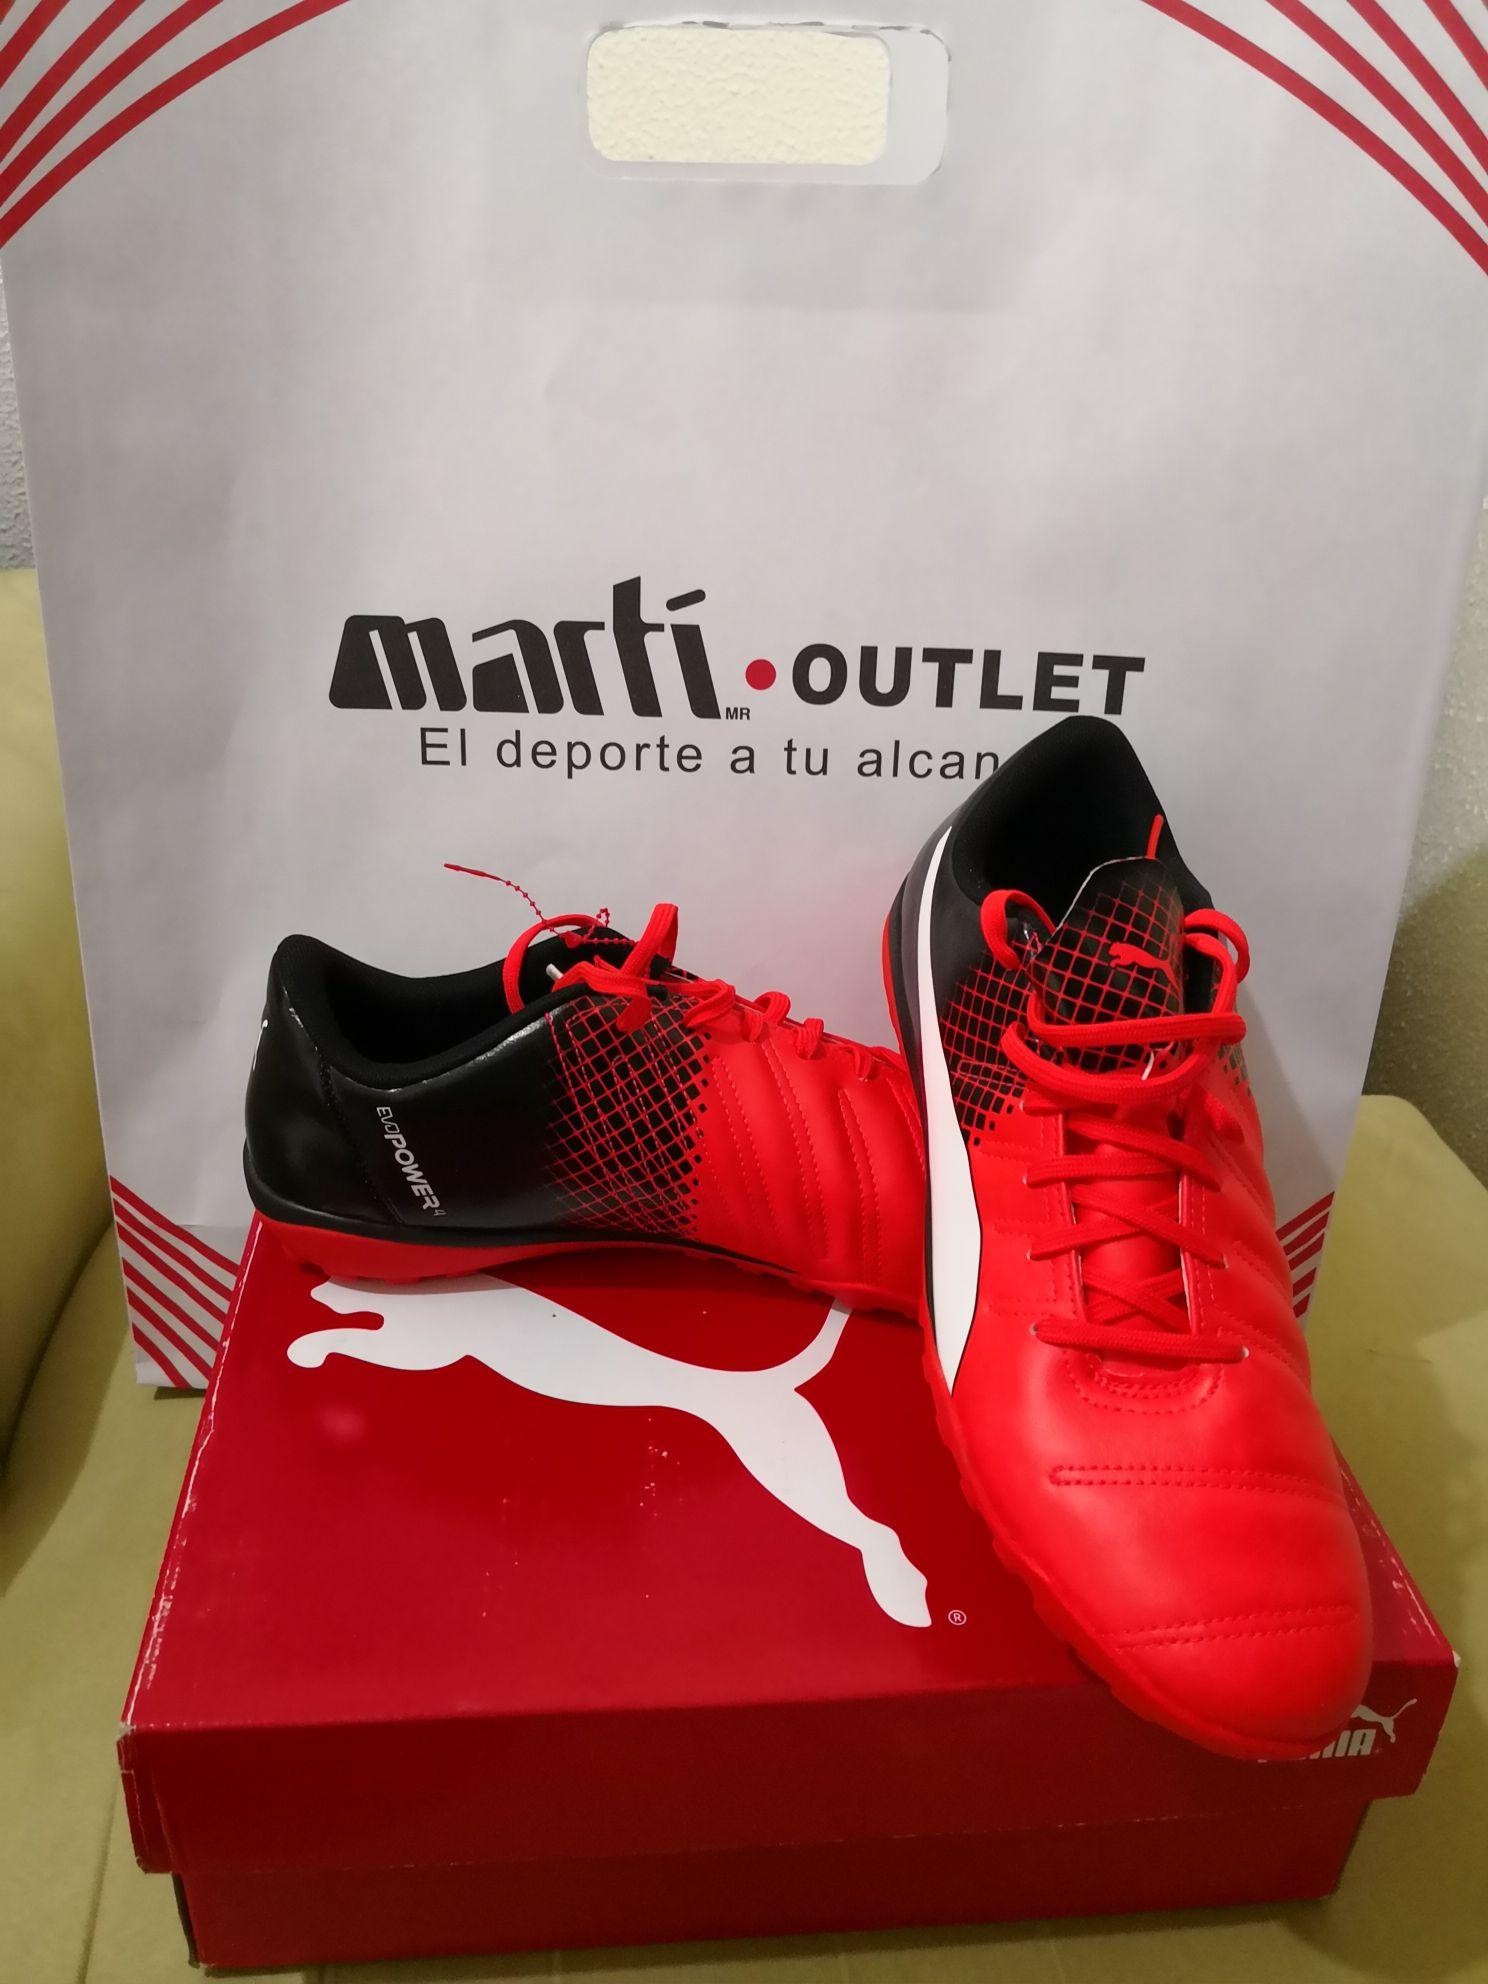 Martí Outlet: Puma EvoPower 4.3 TT (Zapatos de fútbol)